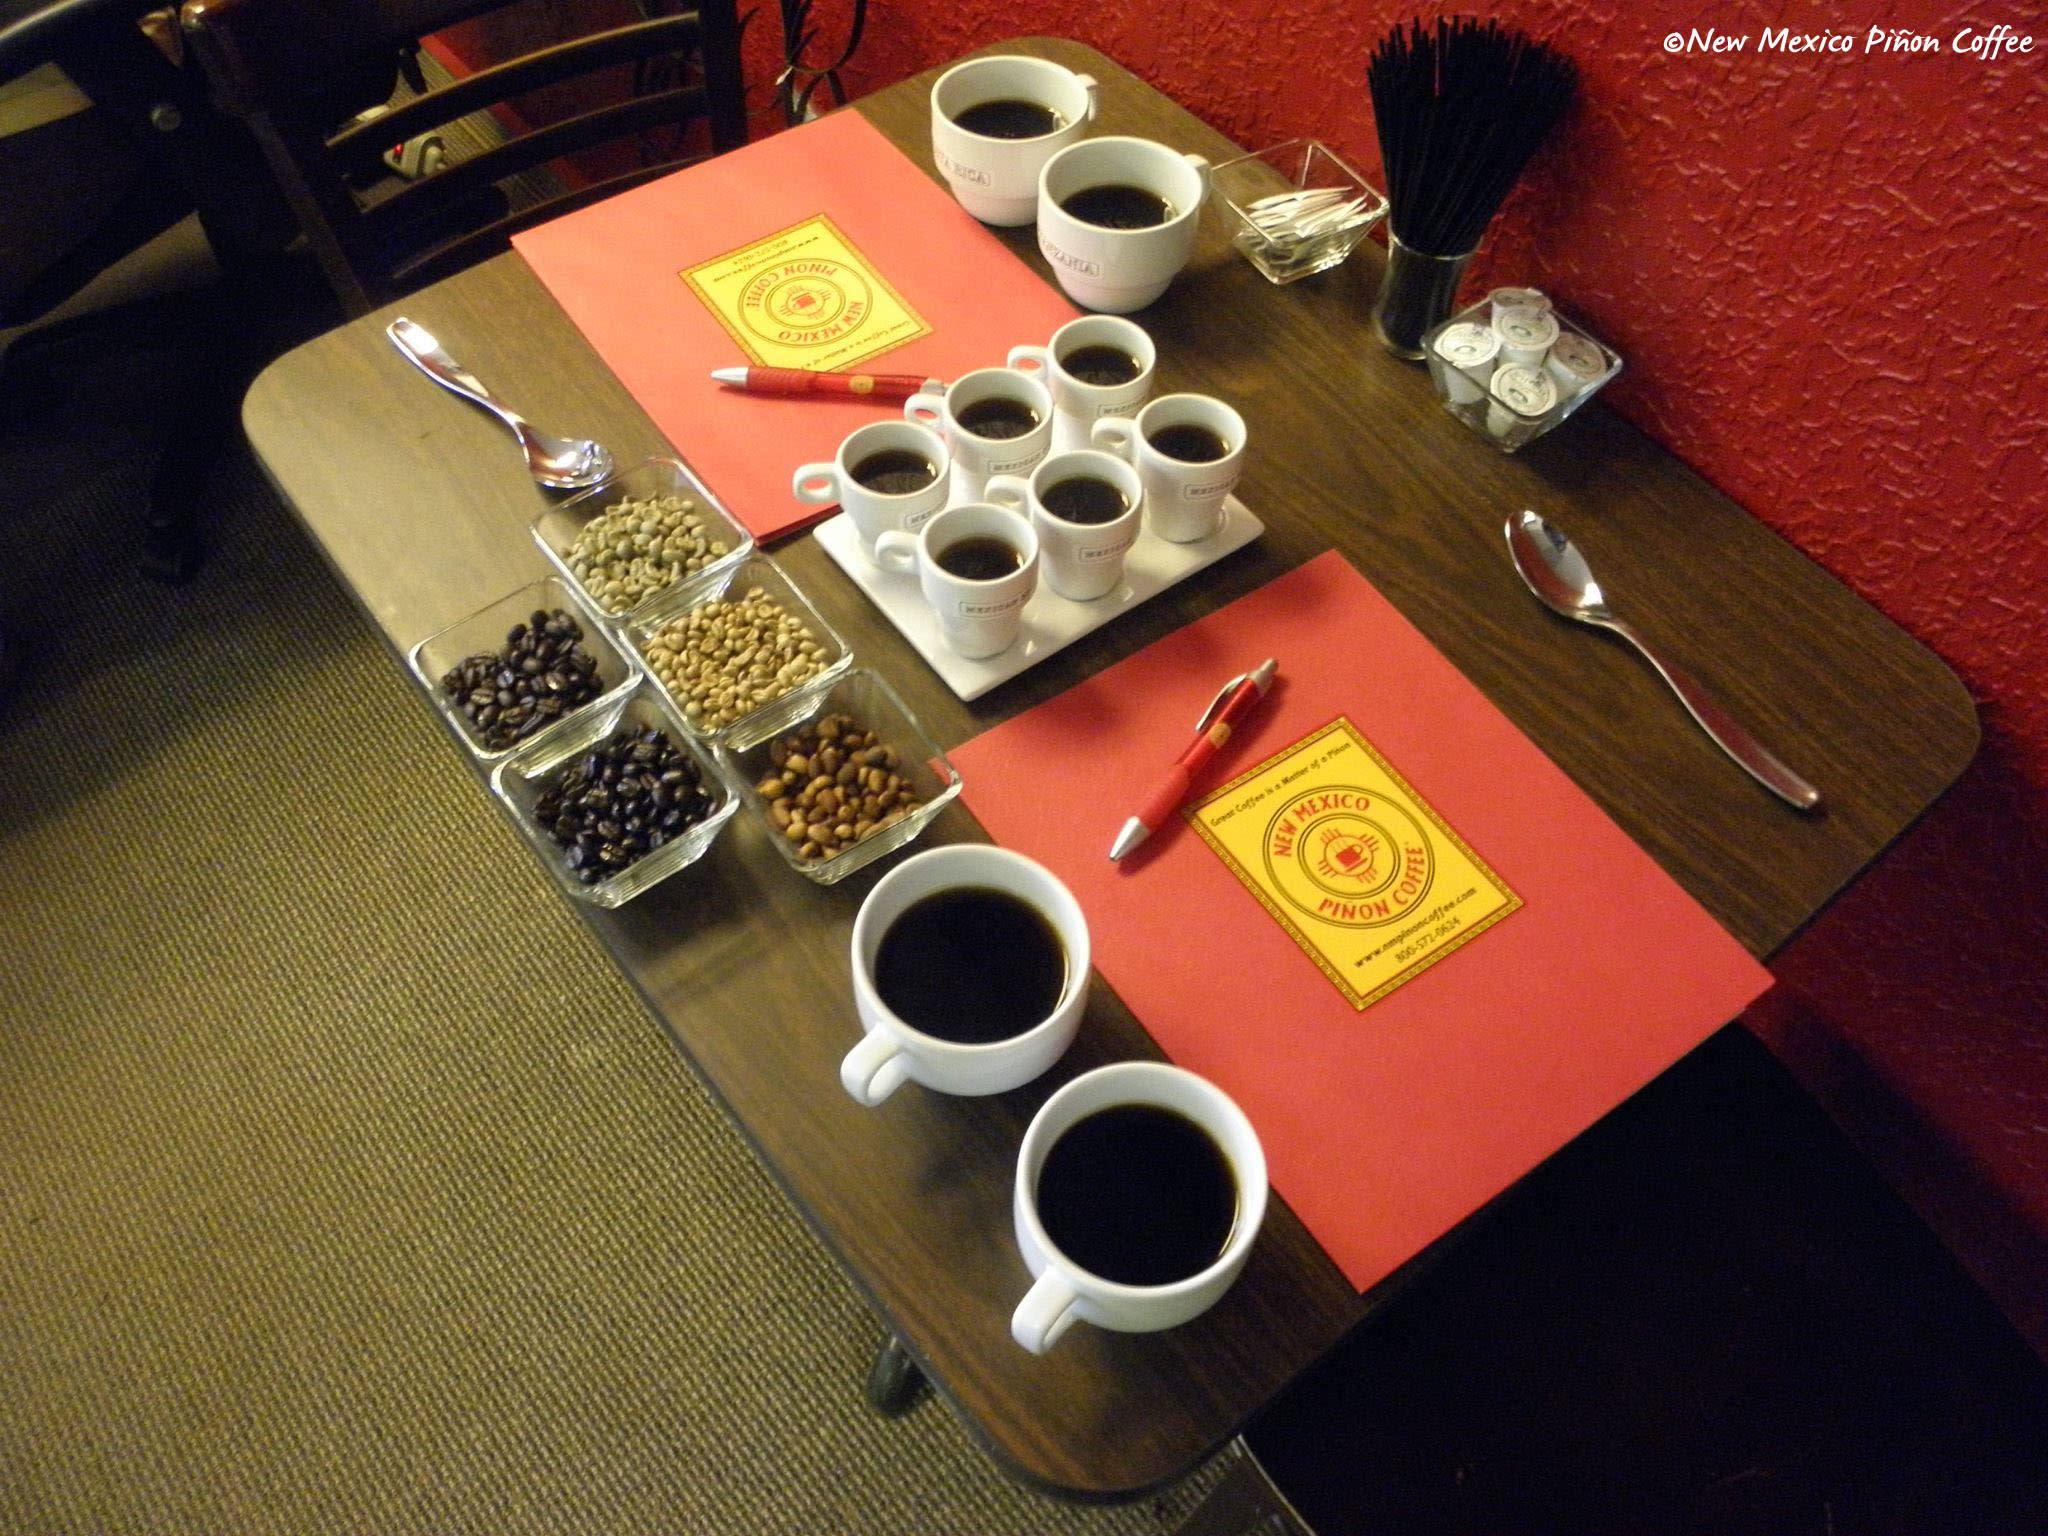 New Mexico Piñon Coffee tasting display